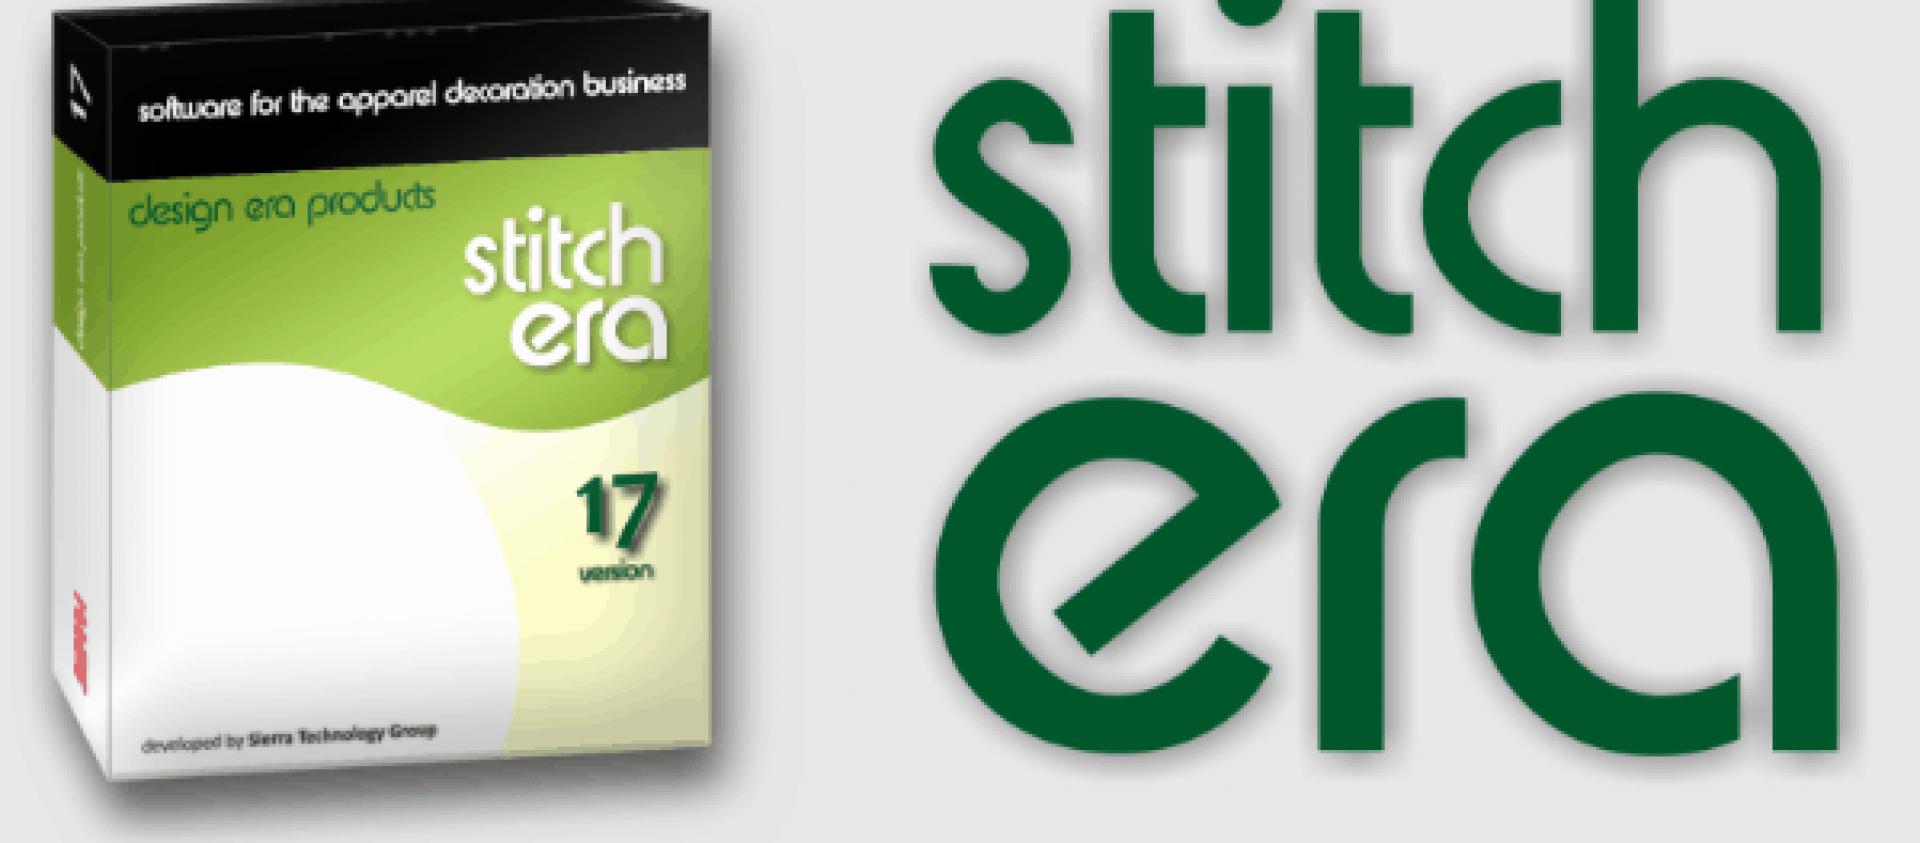 stitch-era-image